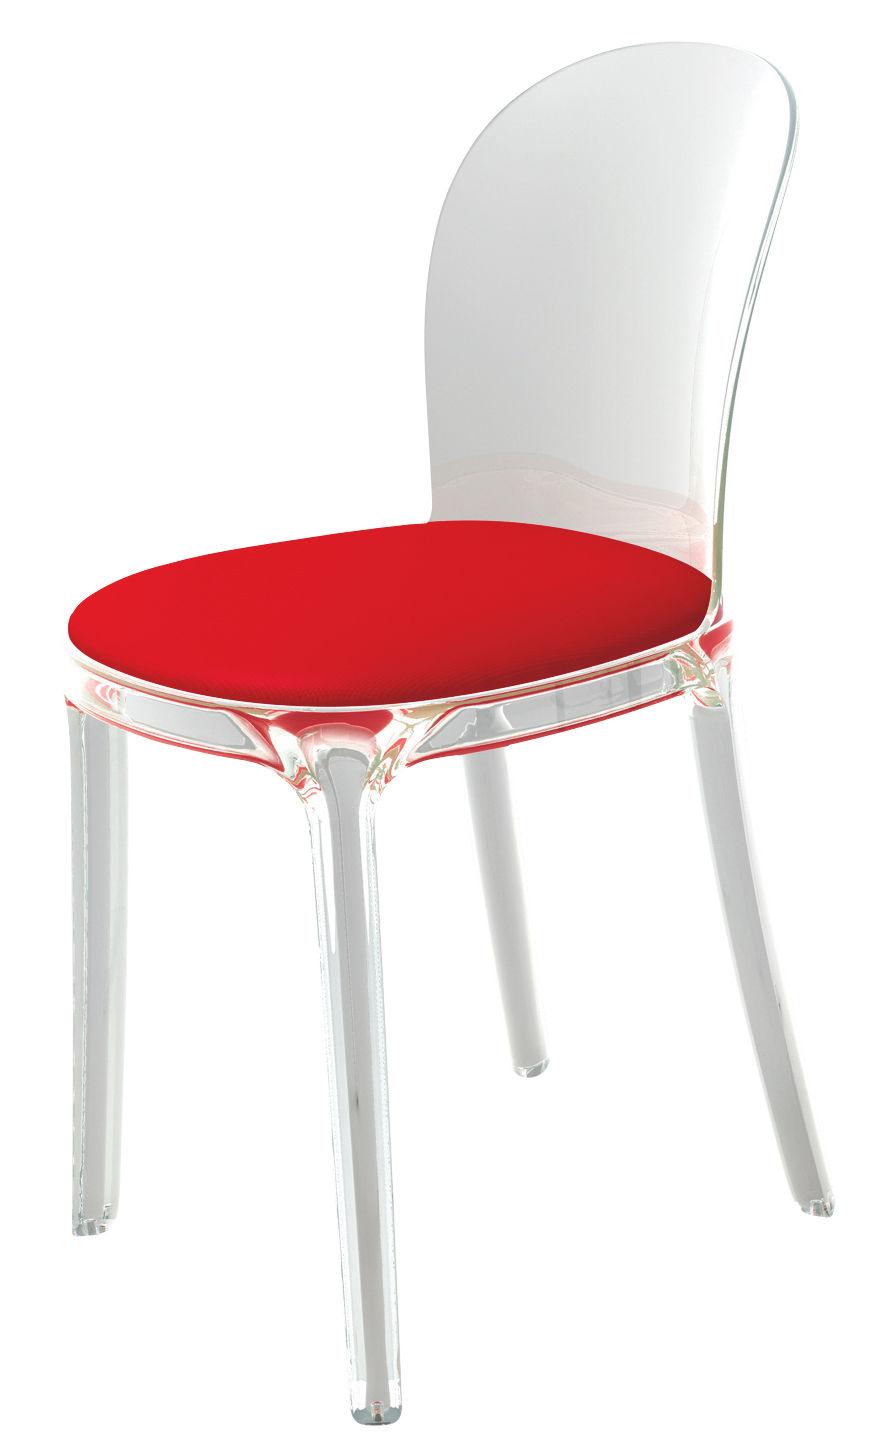 Möbel - Stühle  - Vanity Chair Gepolsterter Stuhl Gestell: transparent - Magis - Kristall / Kissen: rot - Gewebe, Polykarbonat